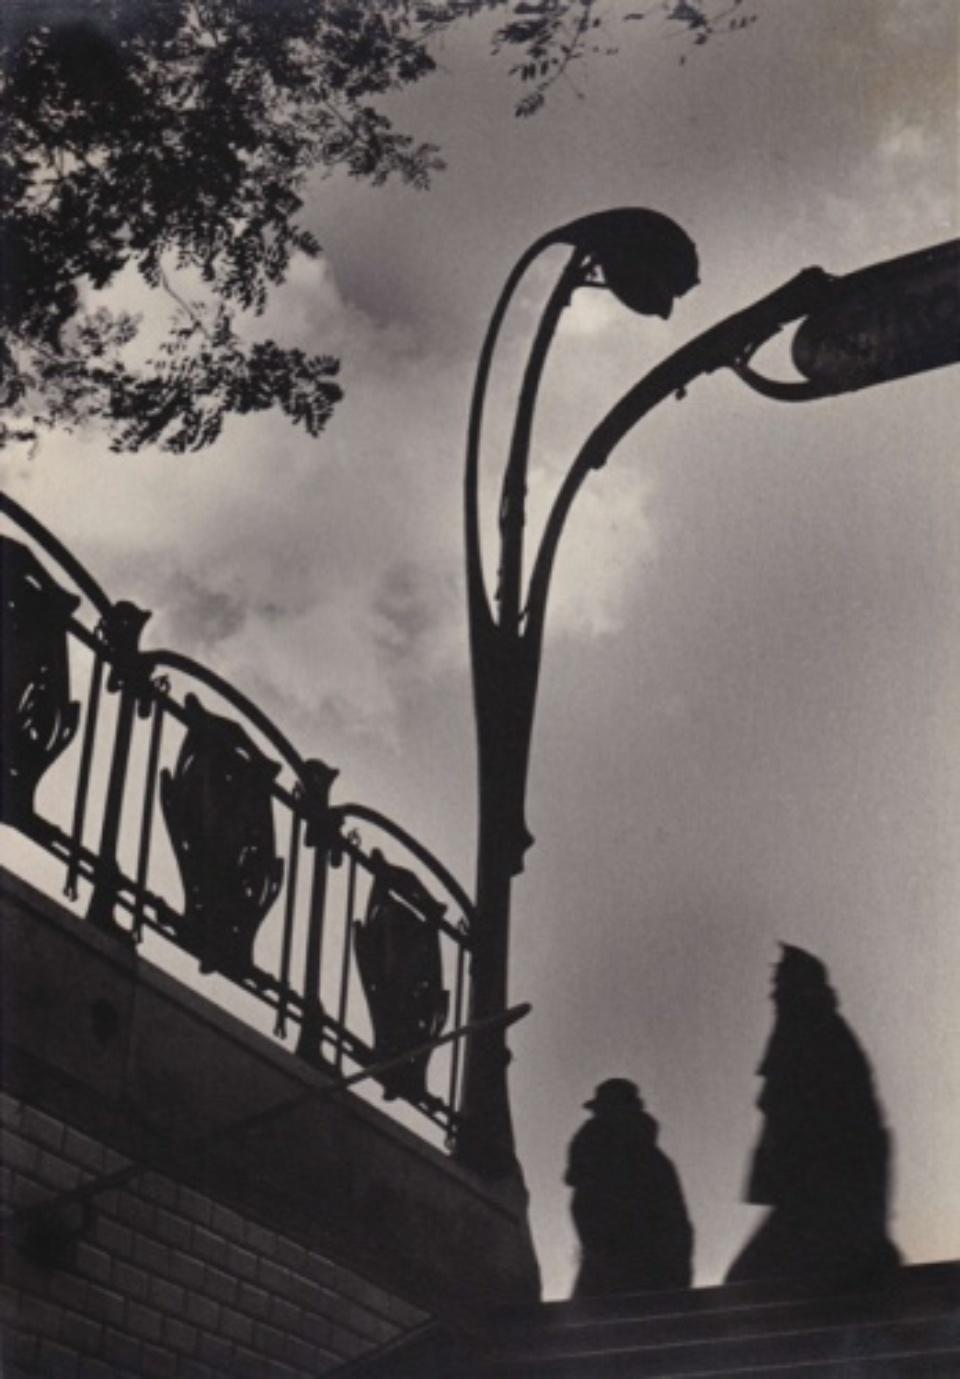 Fred Stein Metro Exit Silhouette Paris, 1939 Vintage gelatin silver print 18 x 17,5 cm